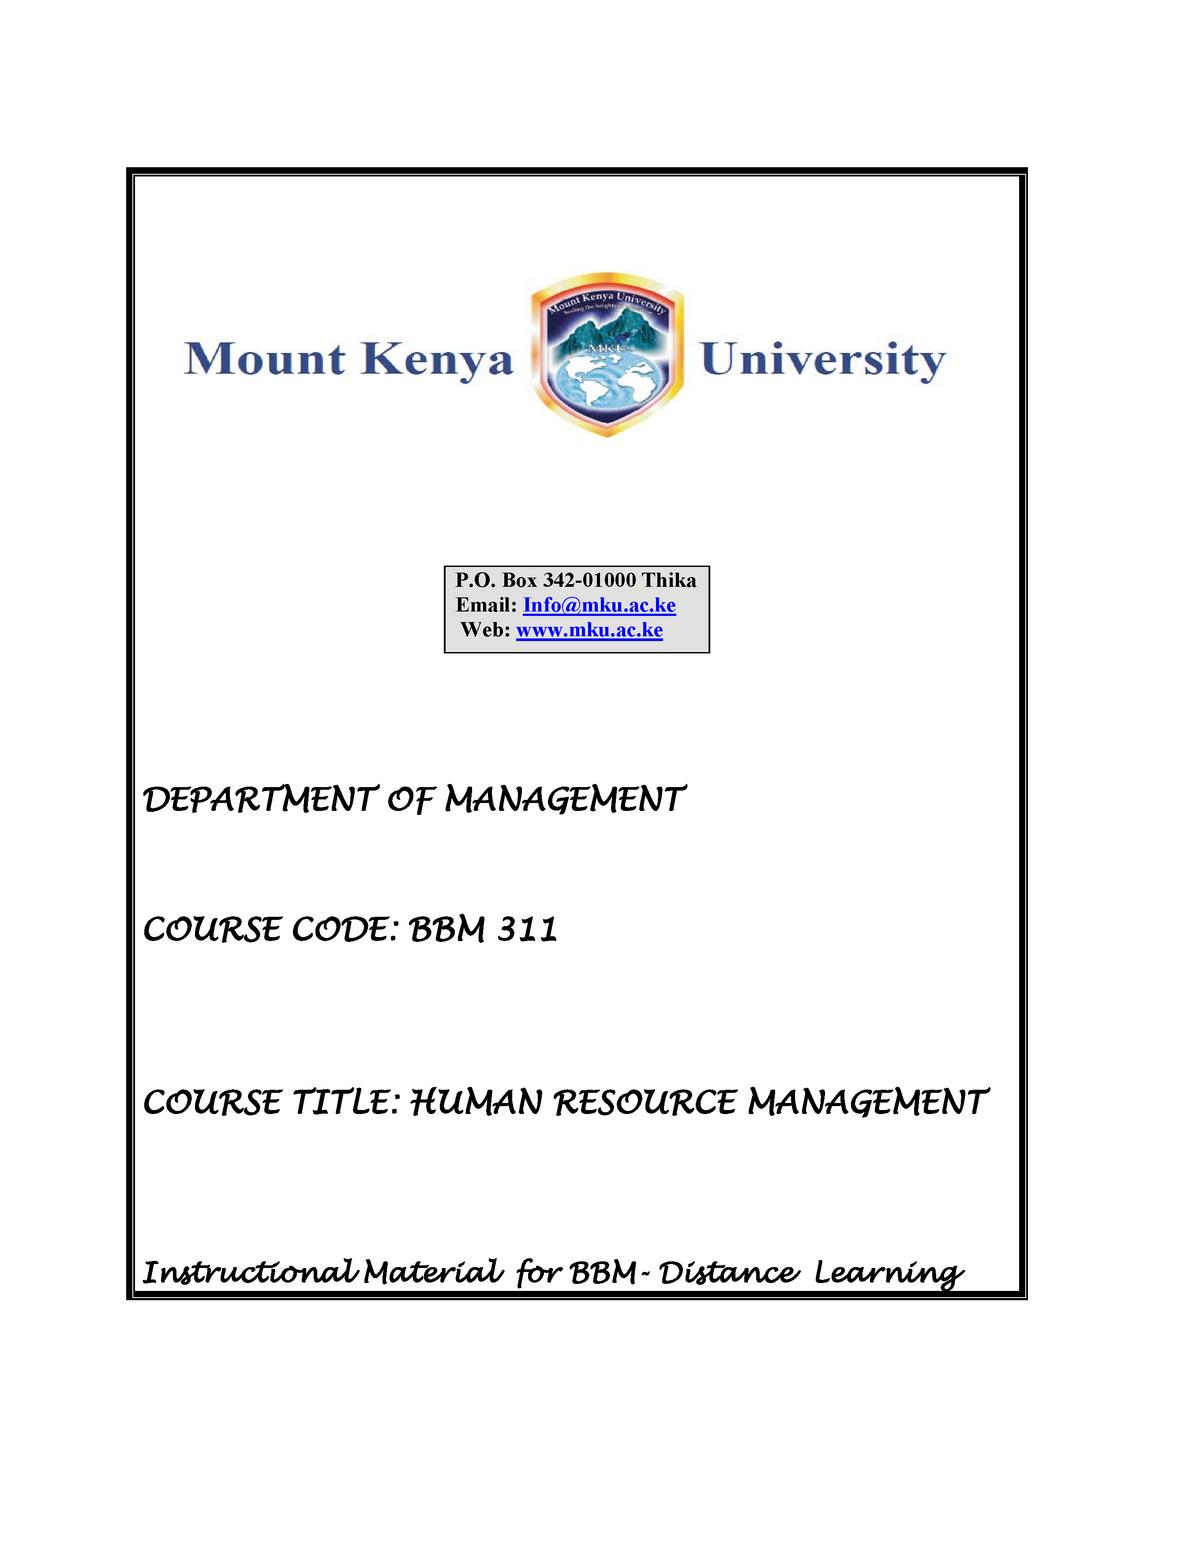 BBM 311 Human Resource Management Module - Human resource